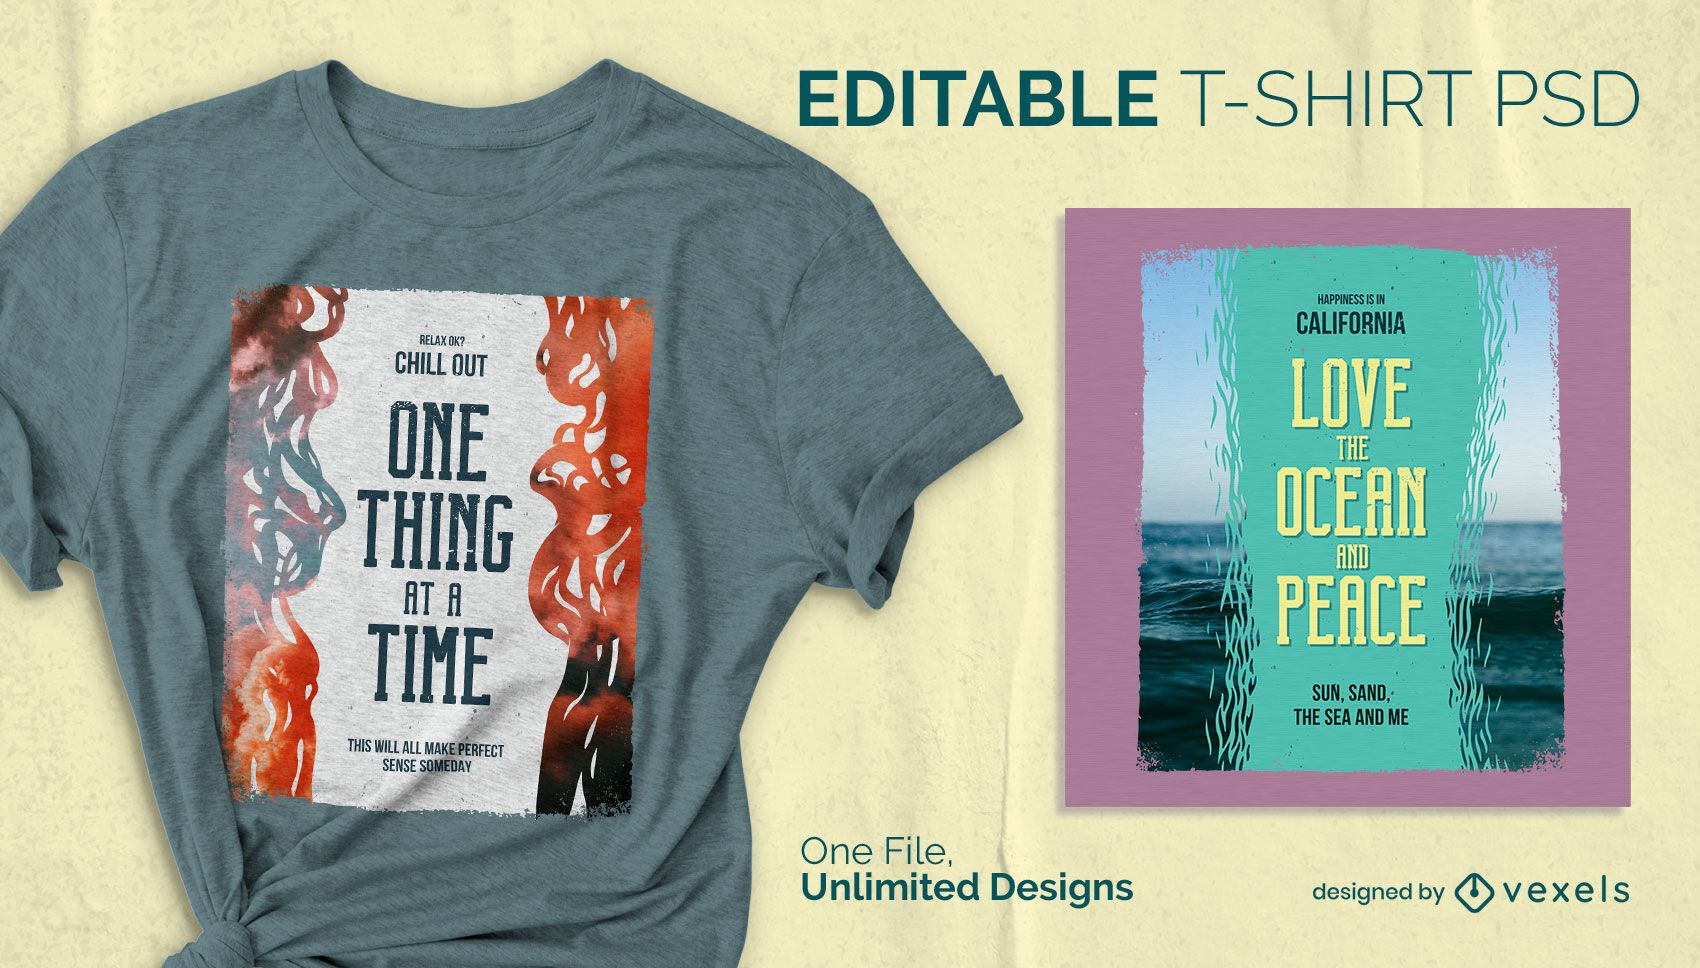 Movie poster t-shirt psd design